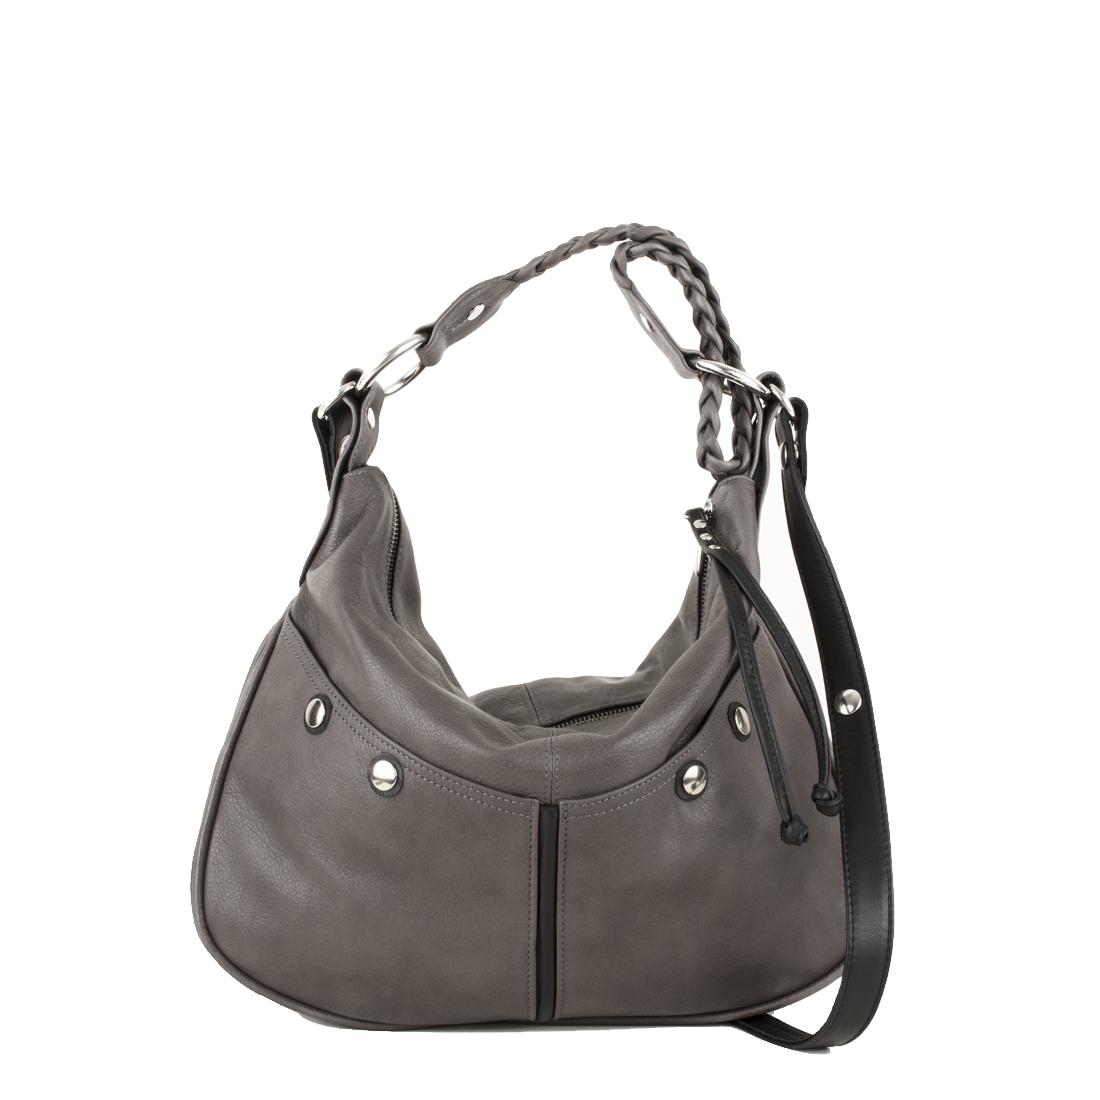 Small Plaited Satchel Grigio Across Body Bag